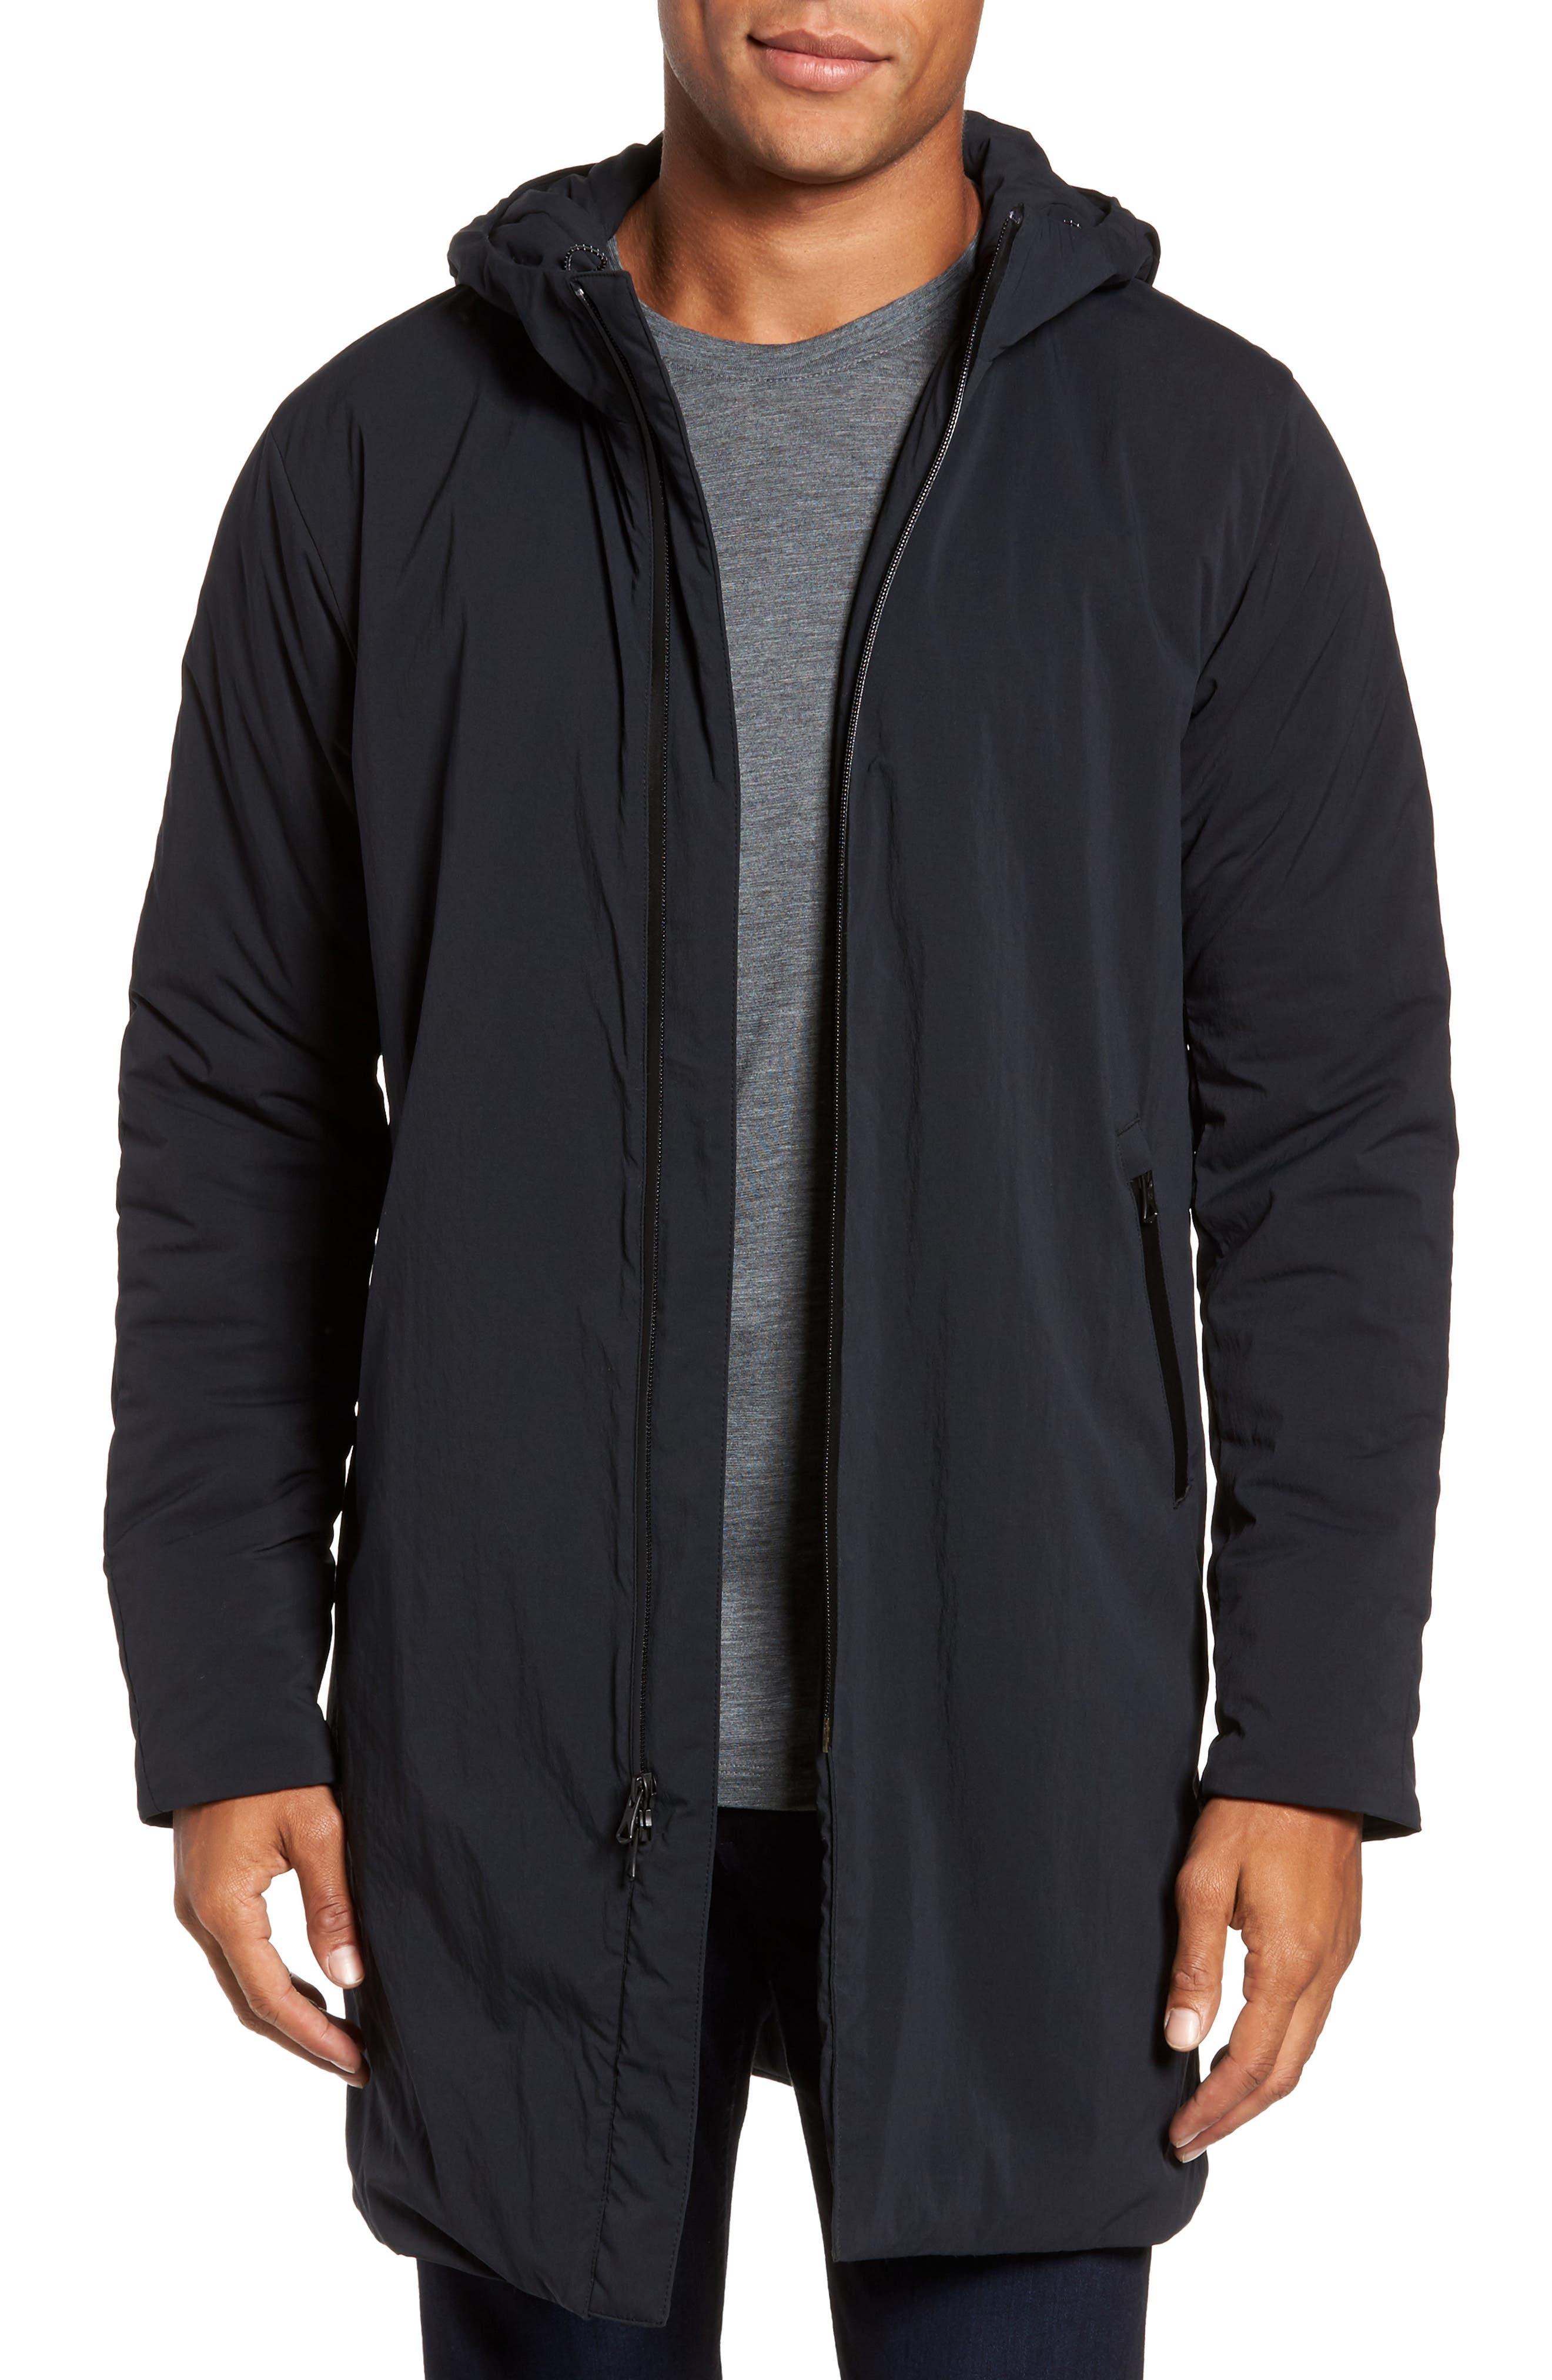 Insulated Trim Sideline Jacket,                         Main,                         color, Black